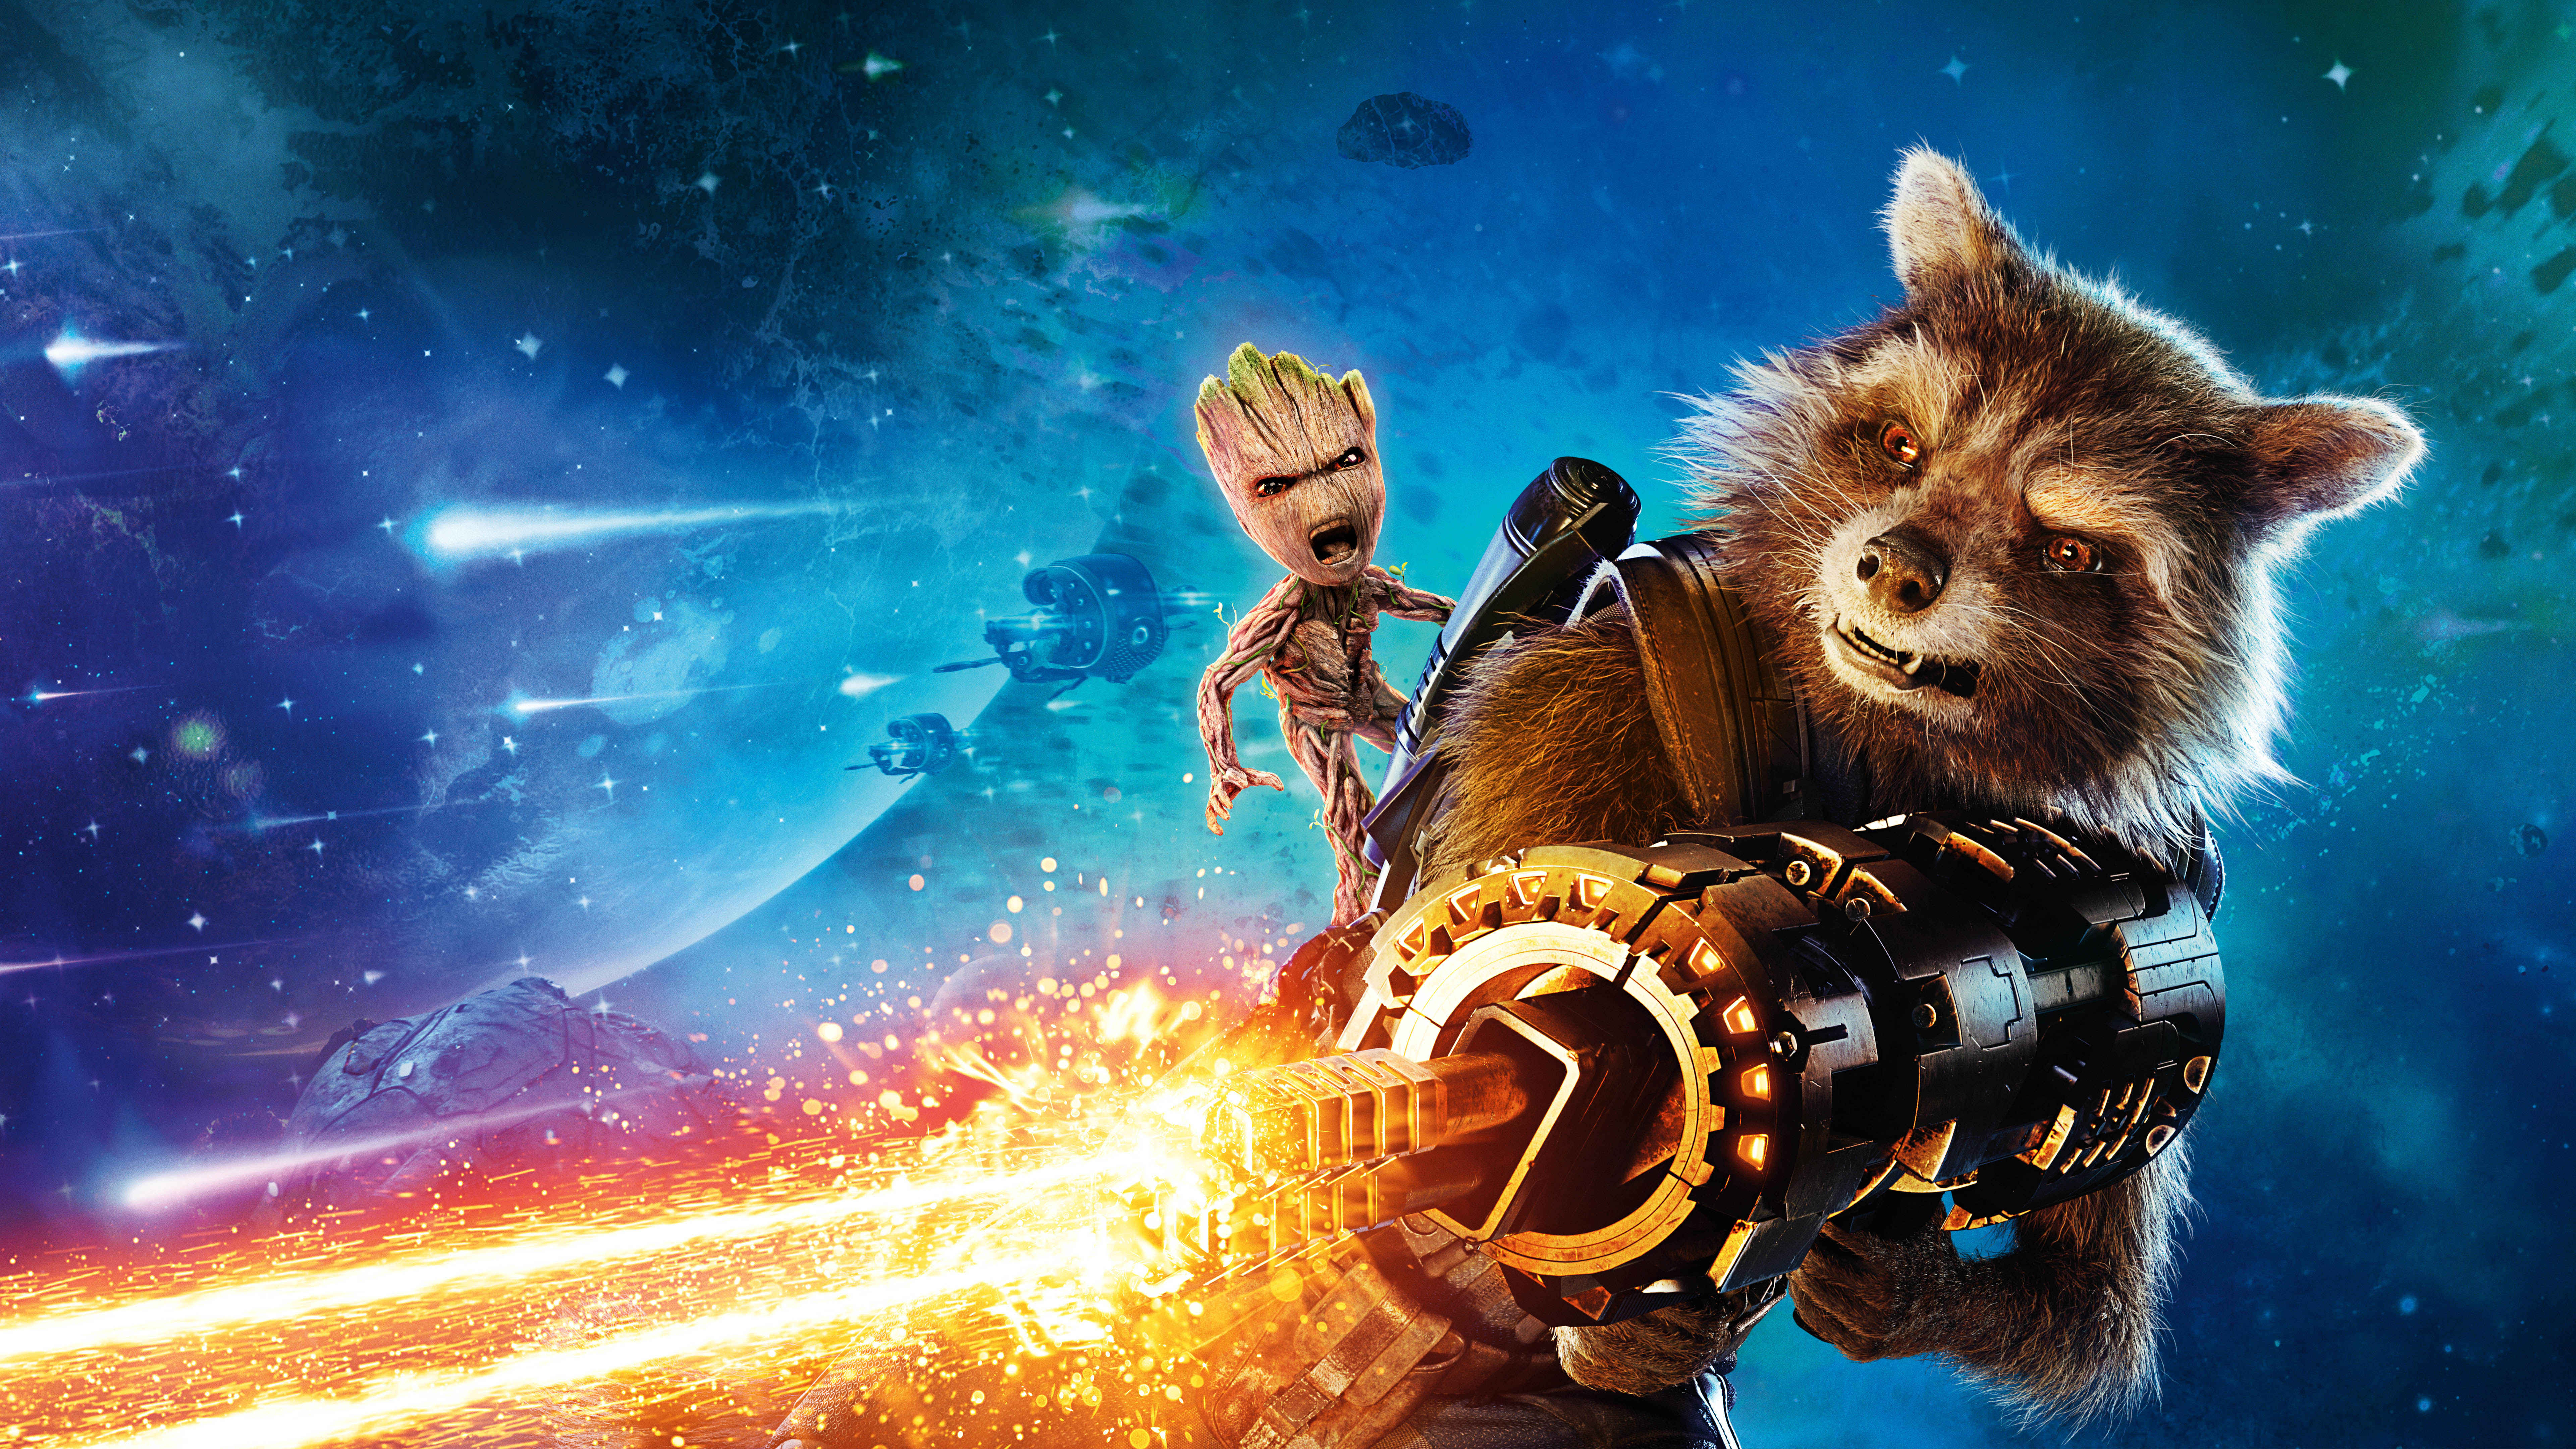 Groot Rocket Raccoon Guardians Of The Galaxy Vol 2 8k Wallpaper